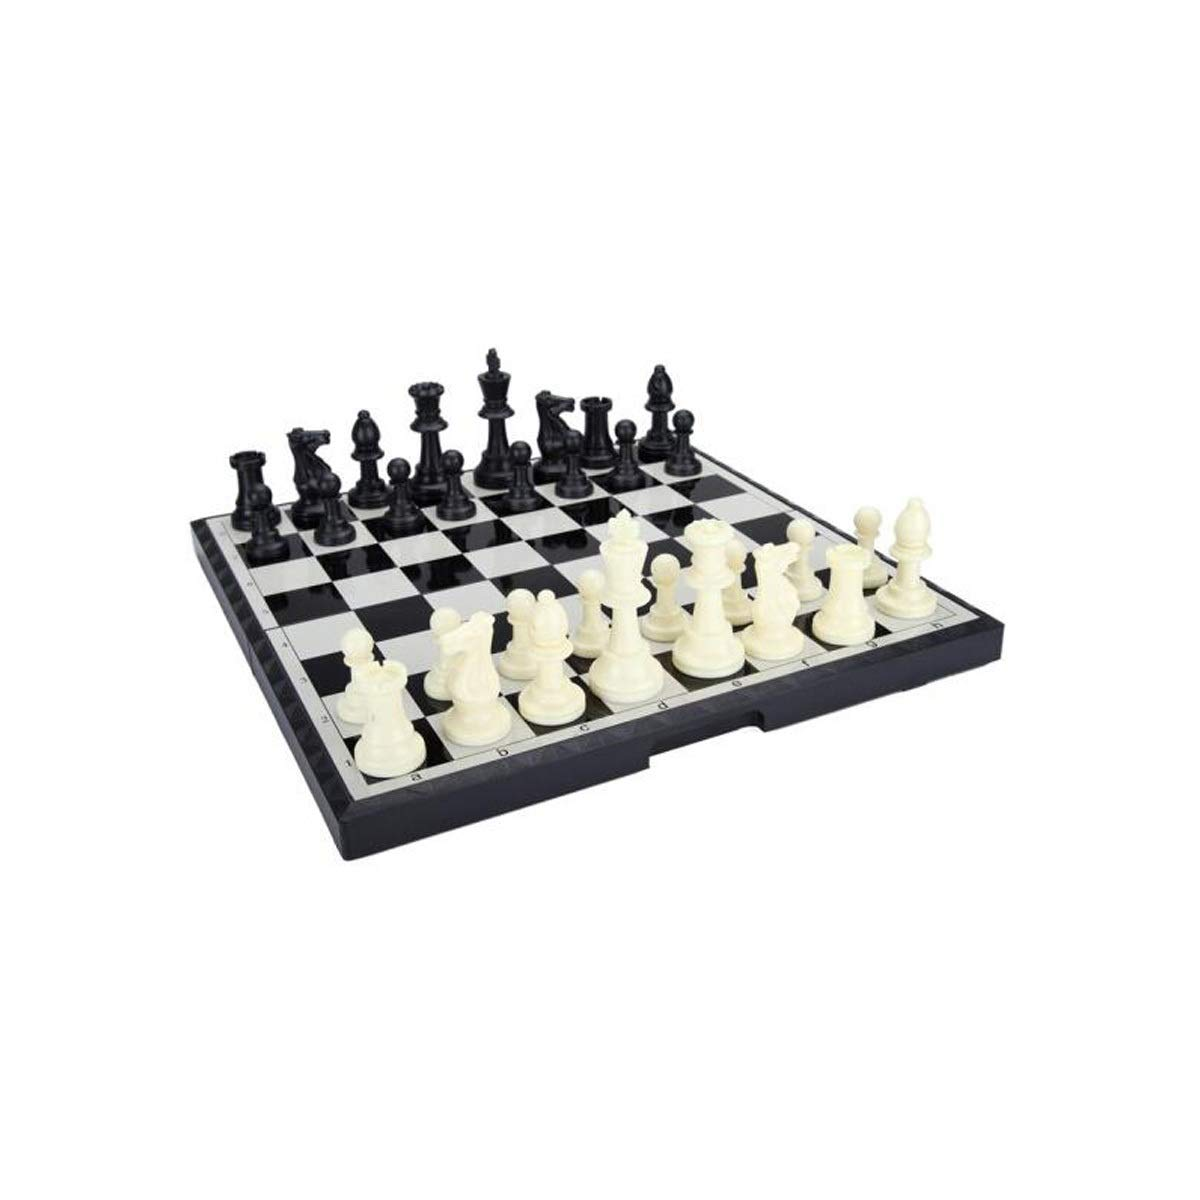 envío gratuito a nivel mundial HUIJUNWENTI Ajedrez, Tablero magnético Plegable portátil Internacional Internacional Internacional de ajedrez B-9 Grande ( Color   negro )  moda clasica